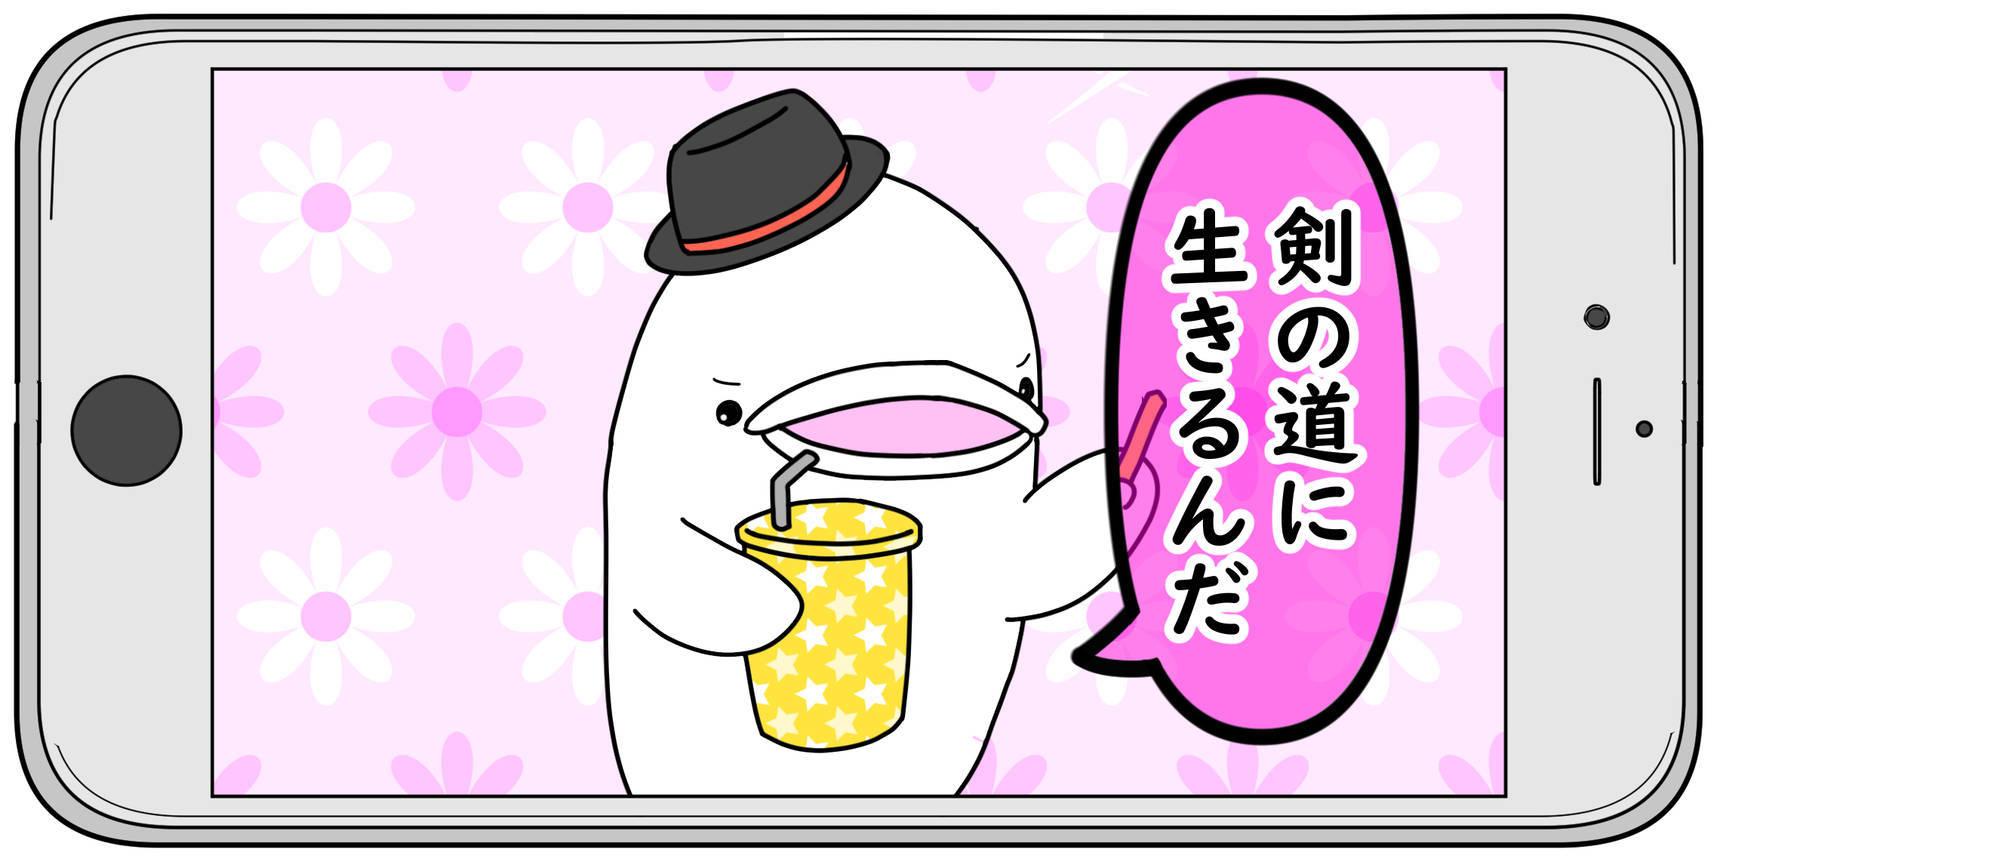 f:id:shiro_iruka:20190509031120j:plain